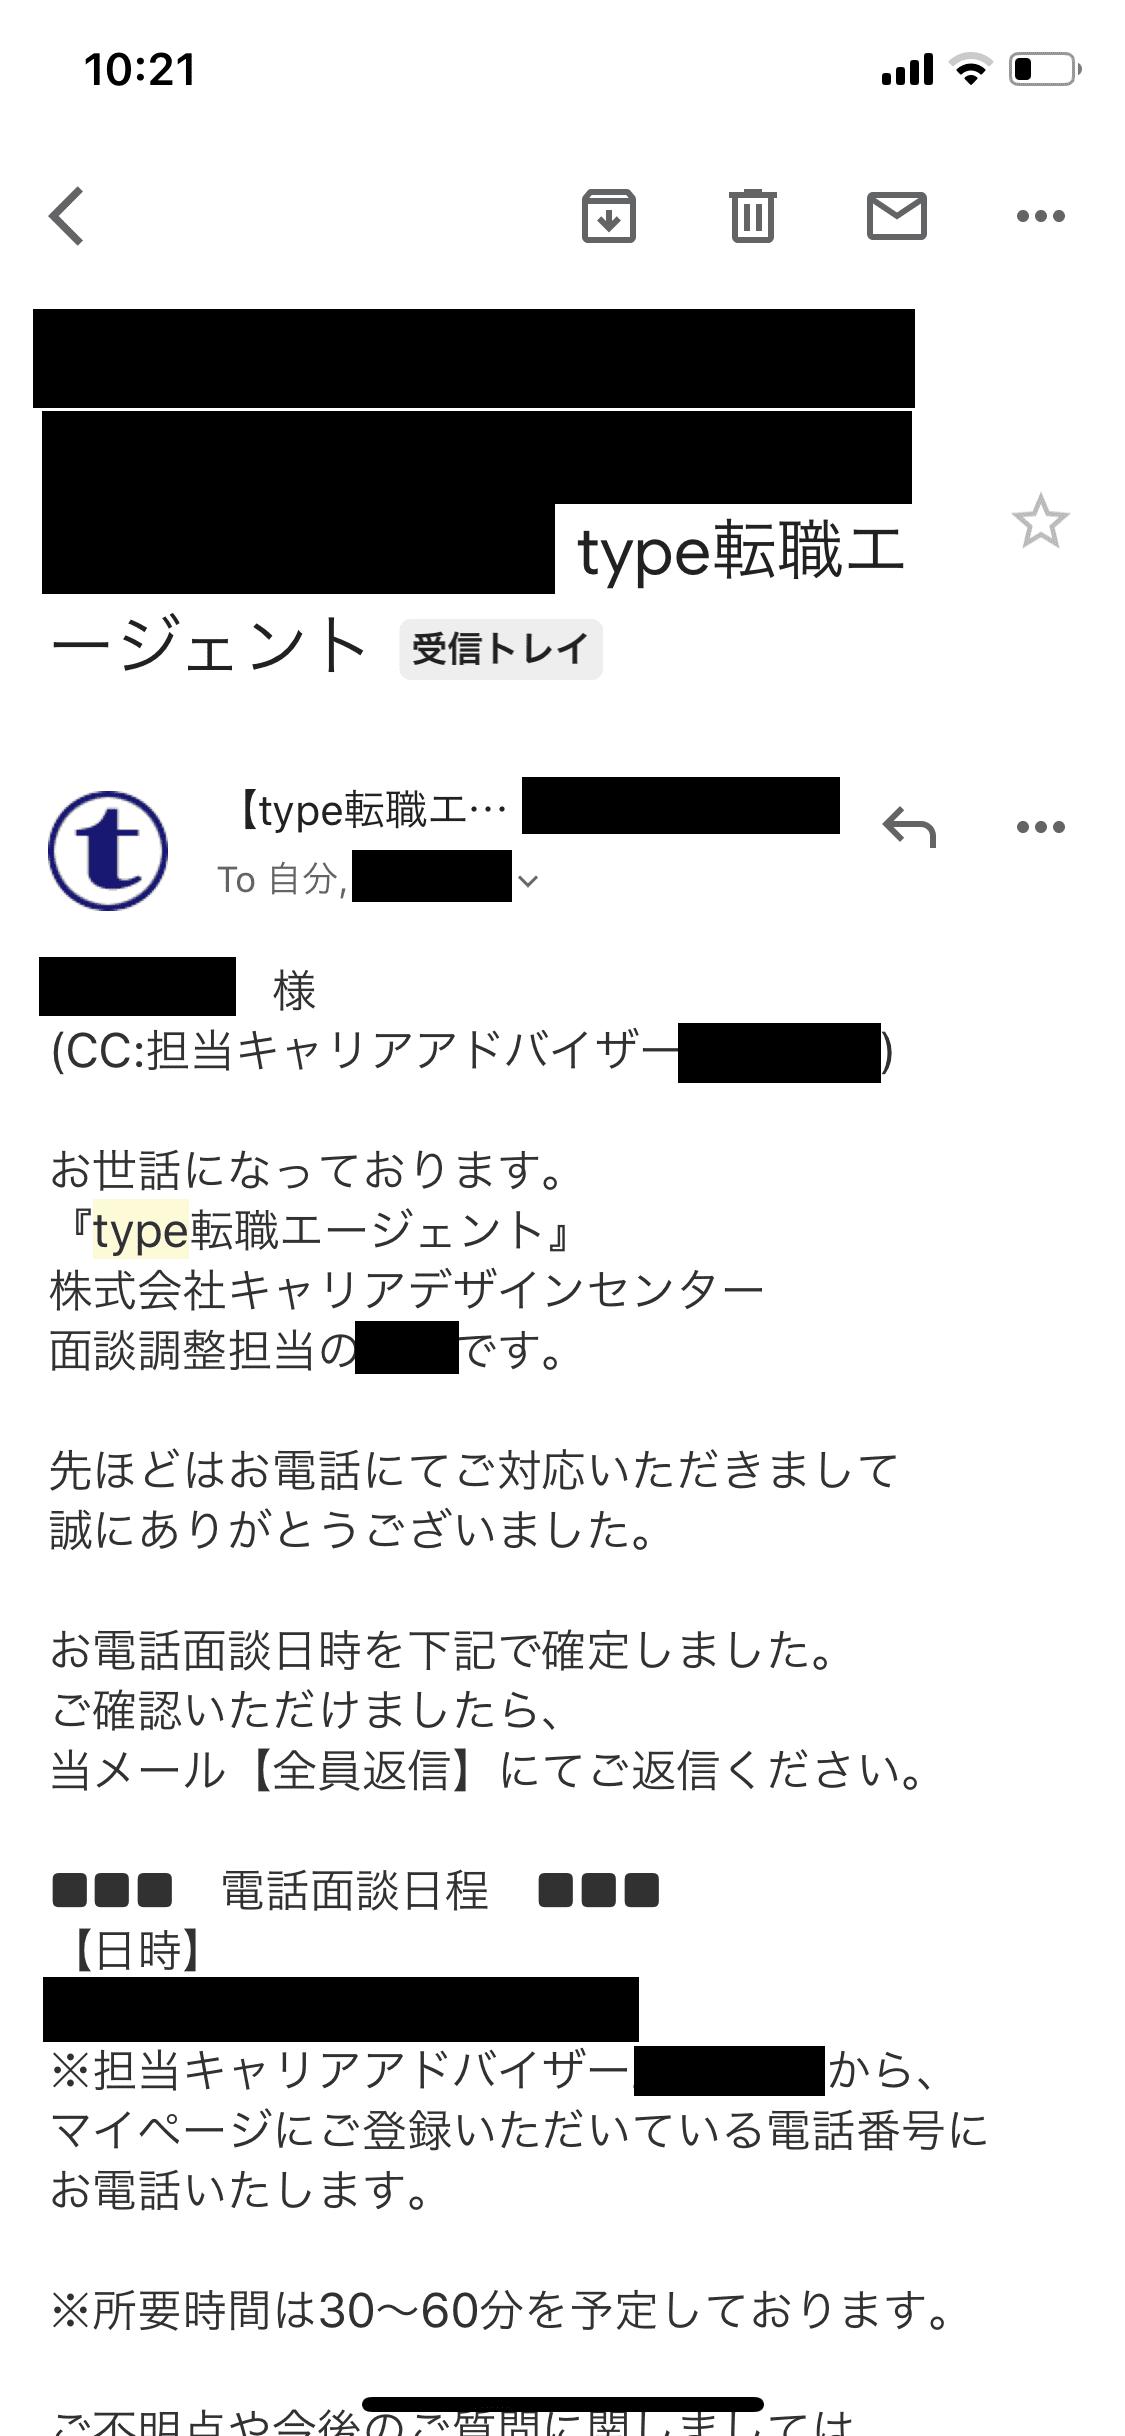 type転職エージェント 東京事業部